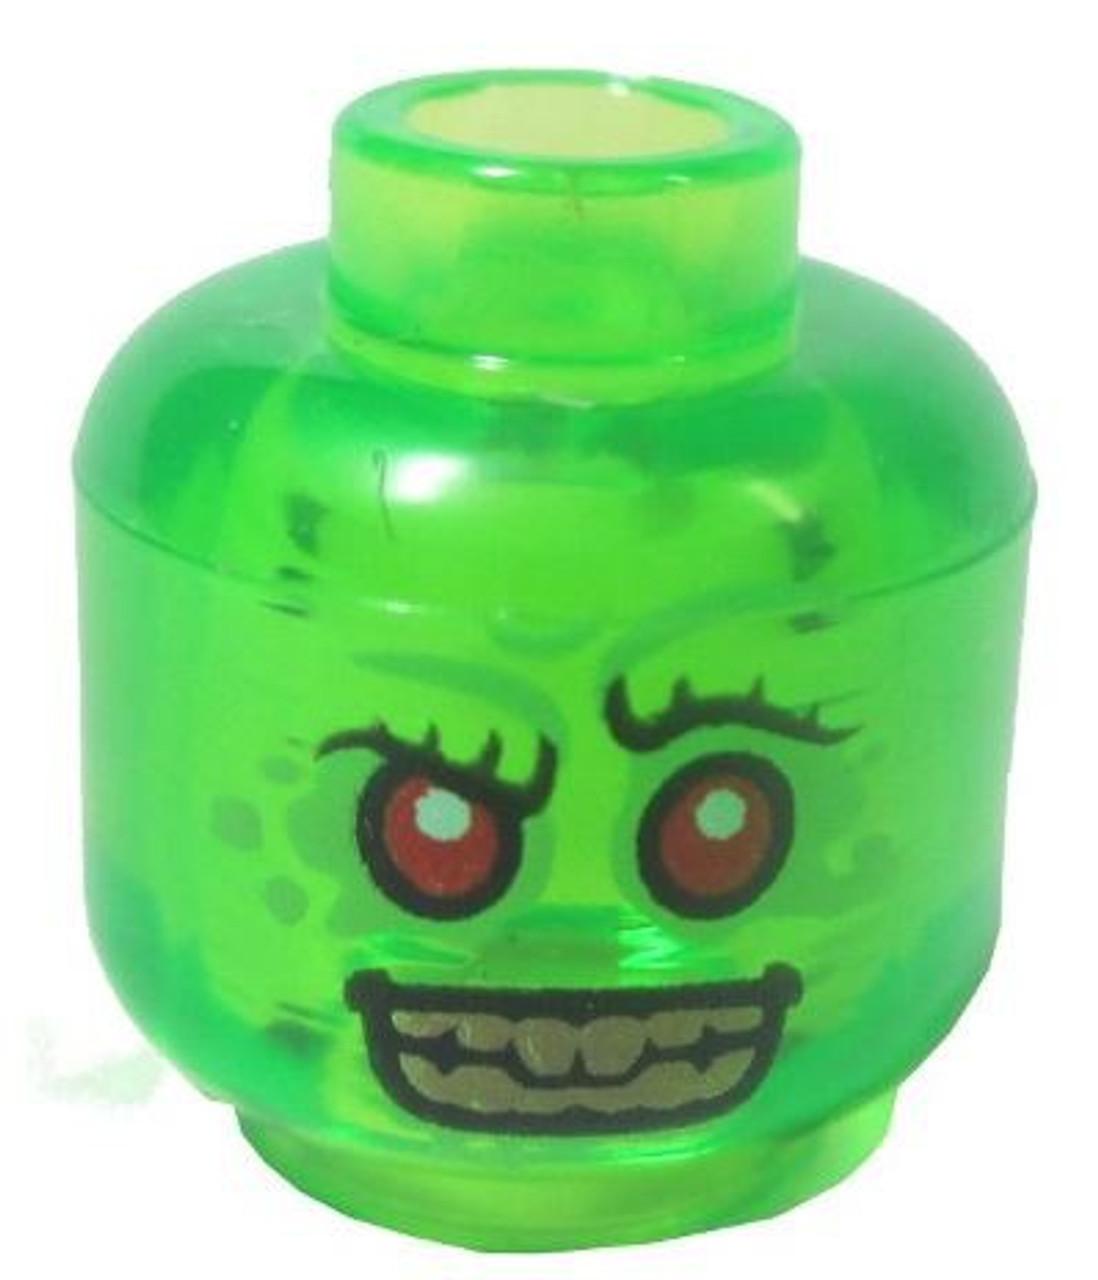 LEGO 4 Eyes /& Antennae Head Modified Alien Mantizoid Olive Green Minifig